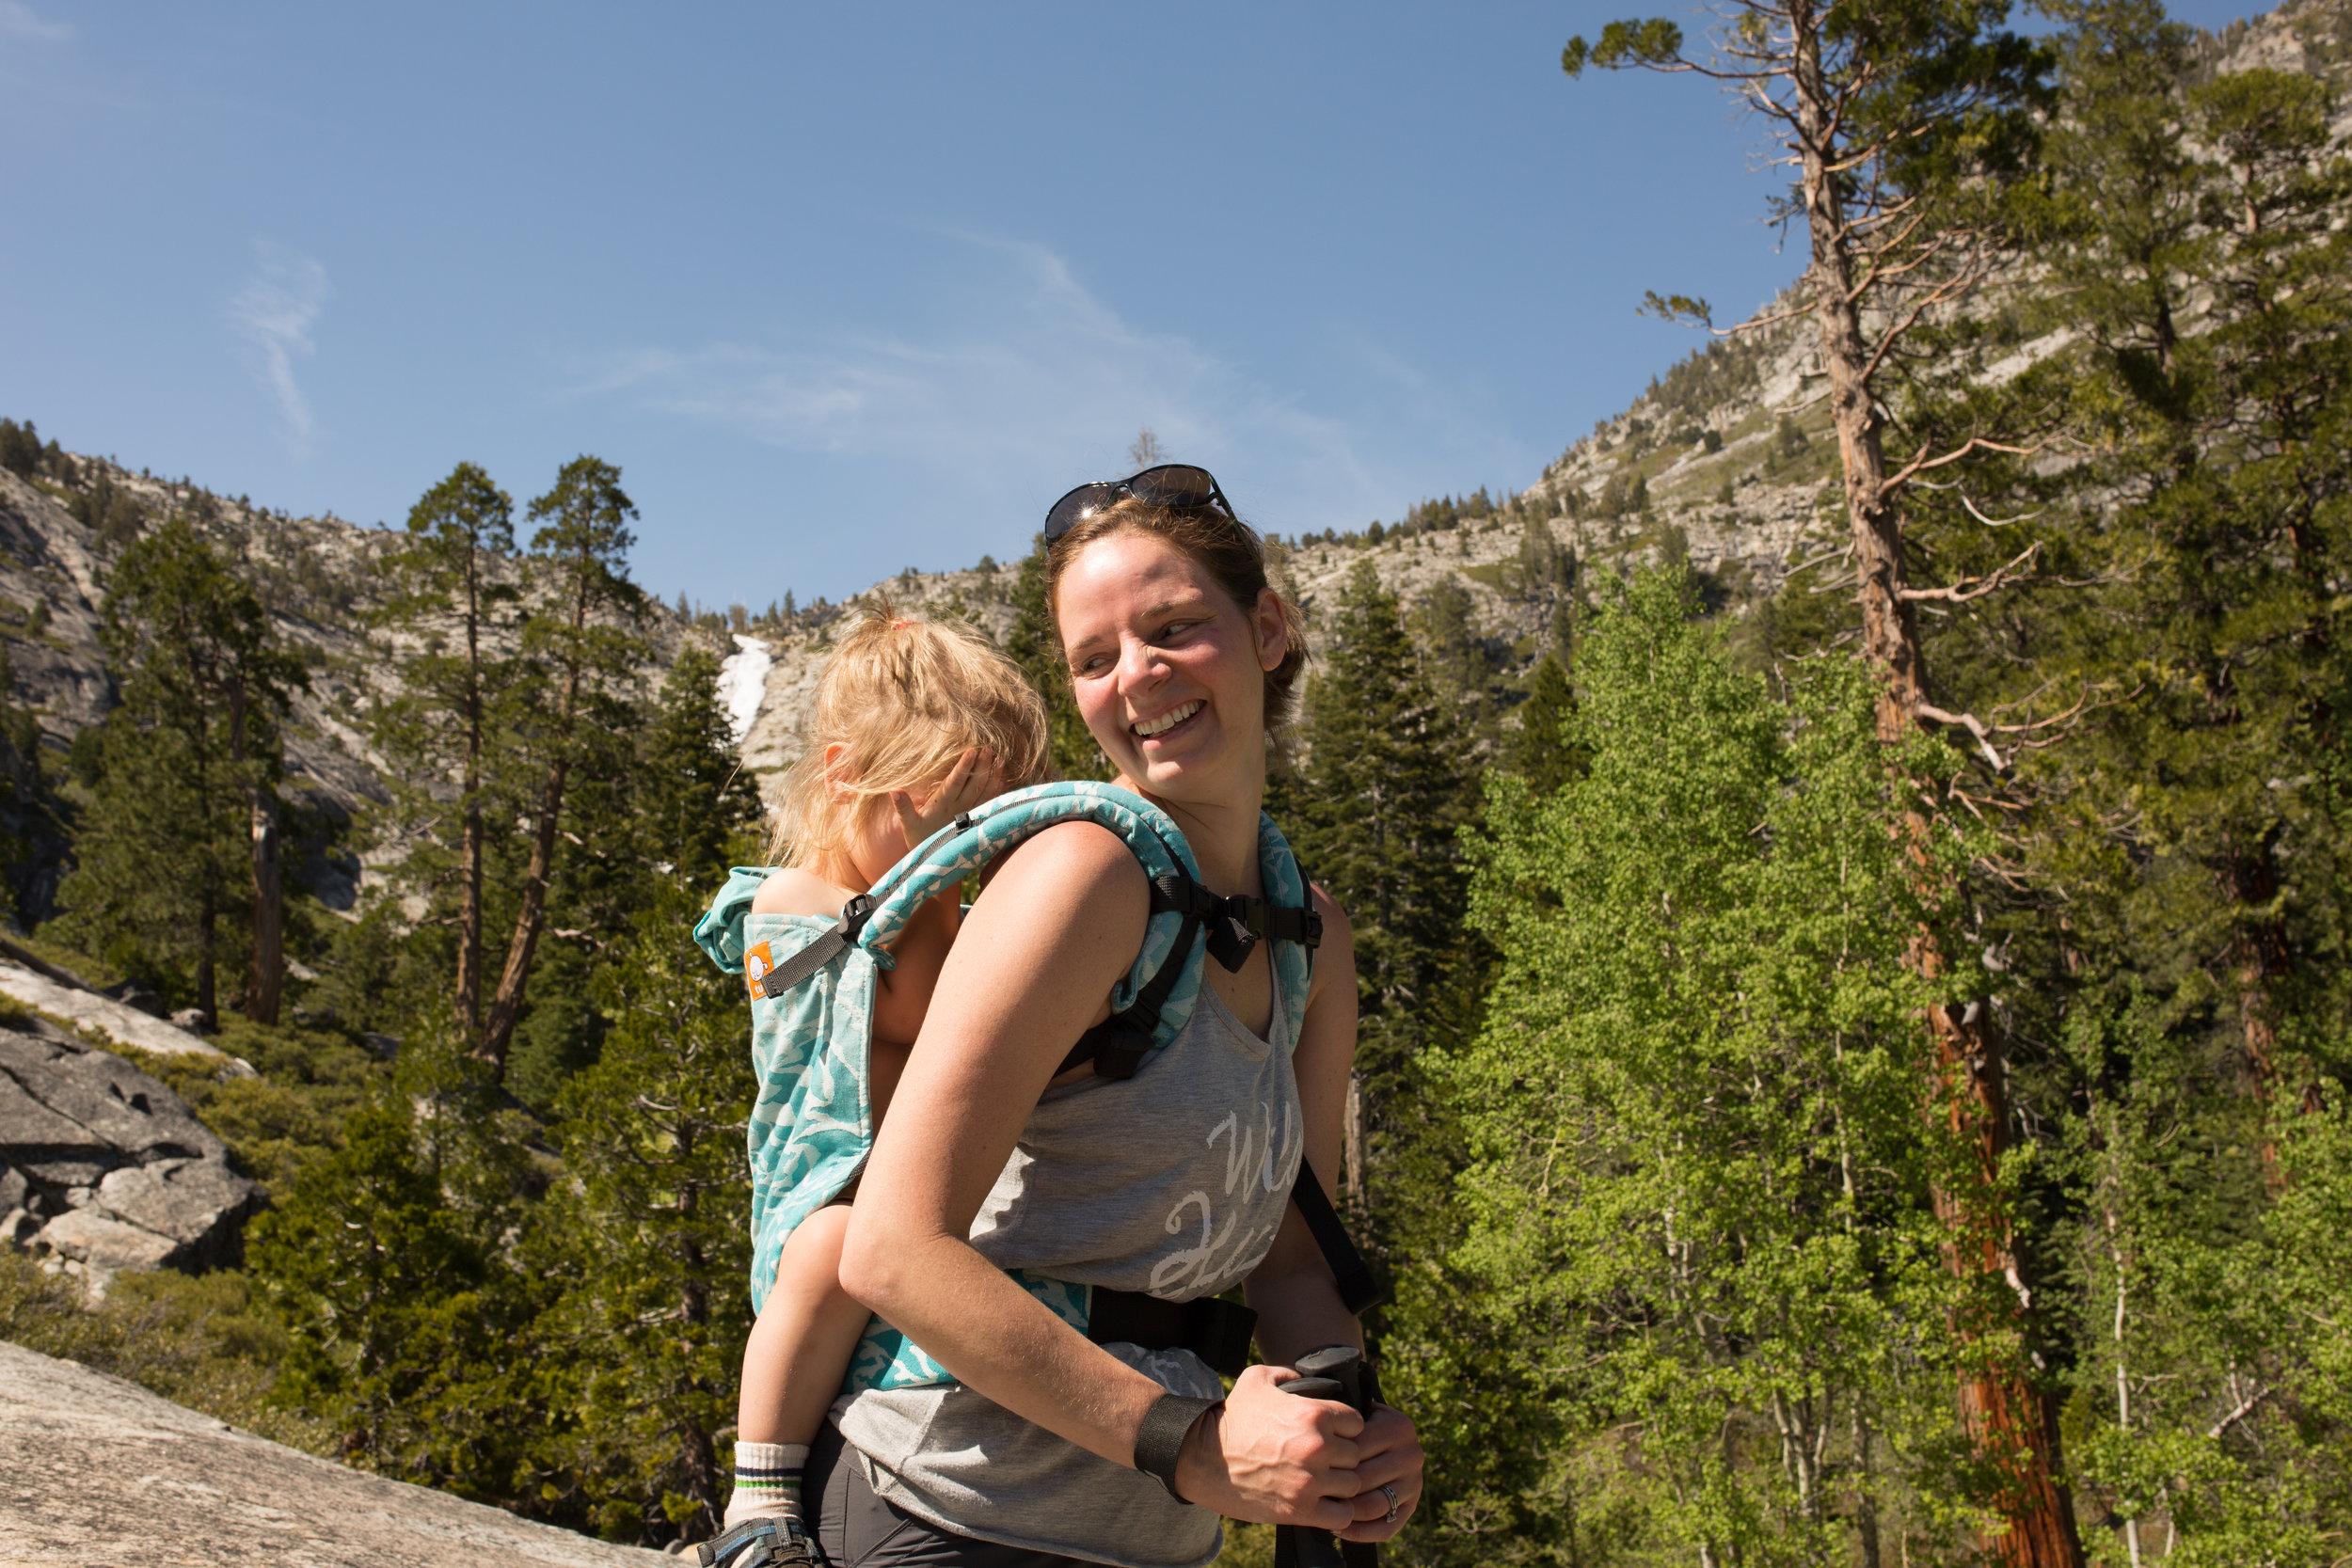 Horsetail-falls-california-family-hike